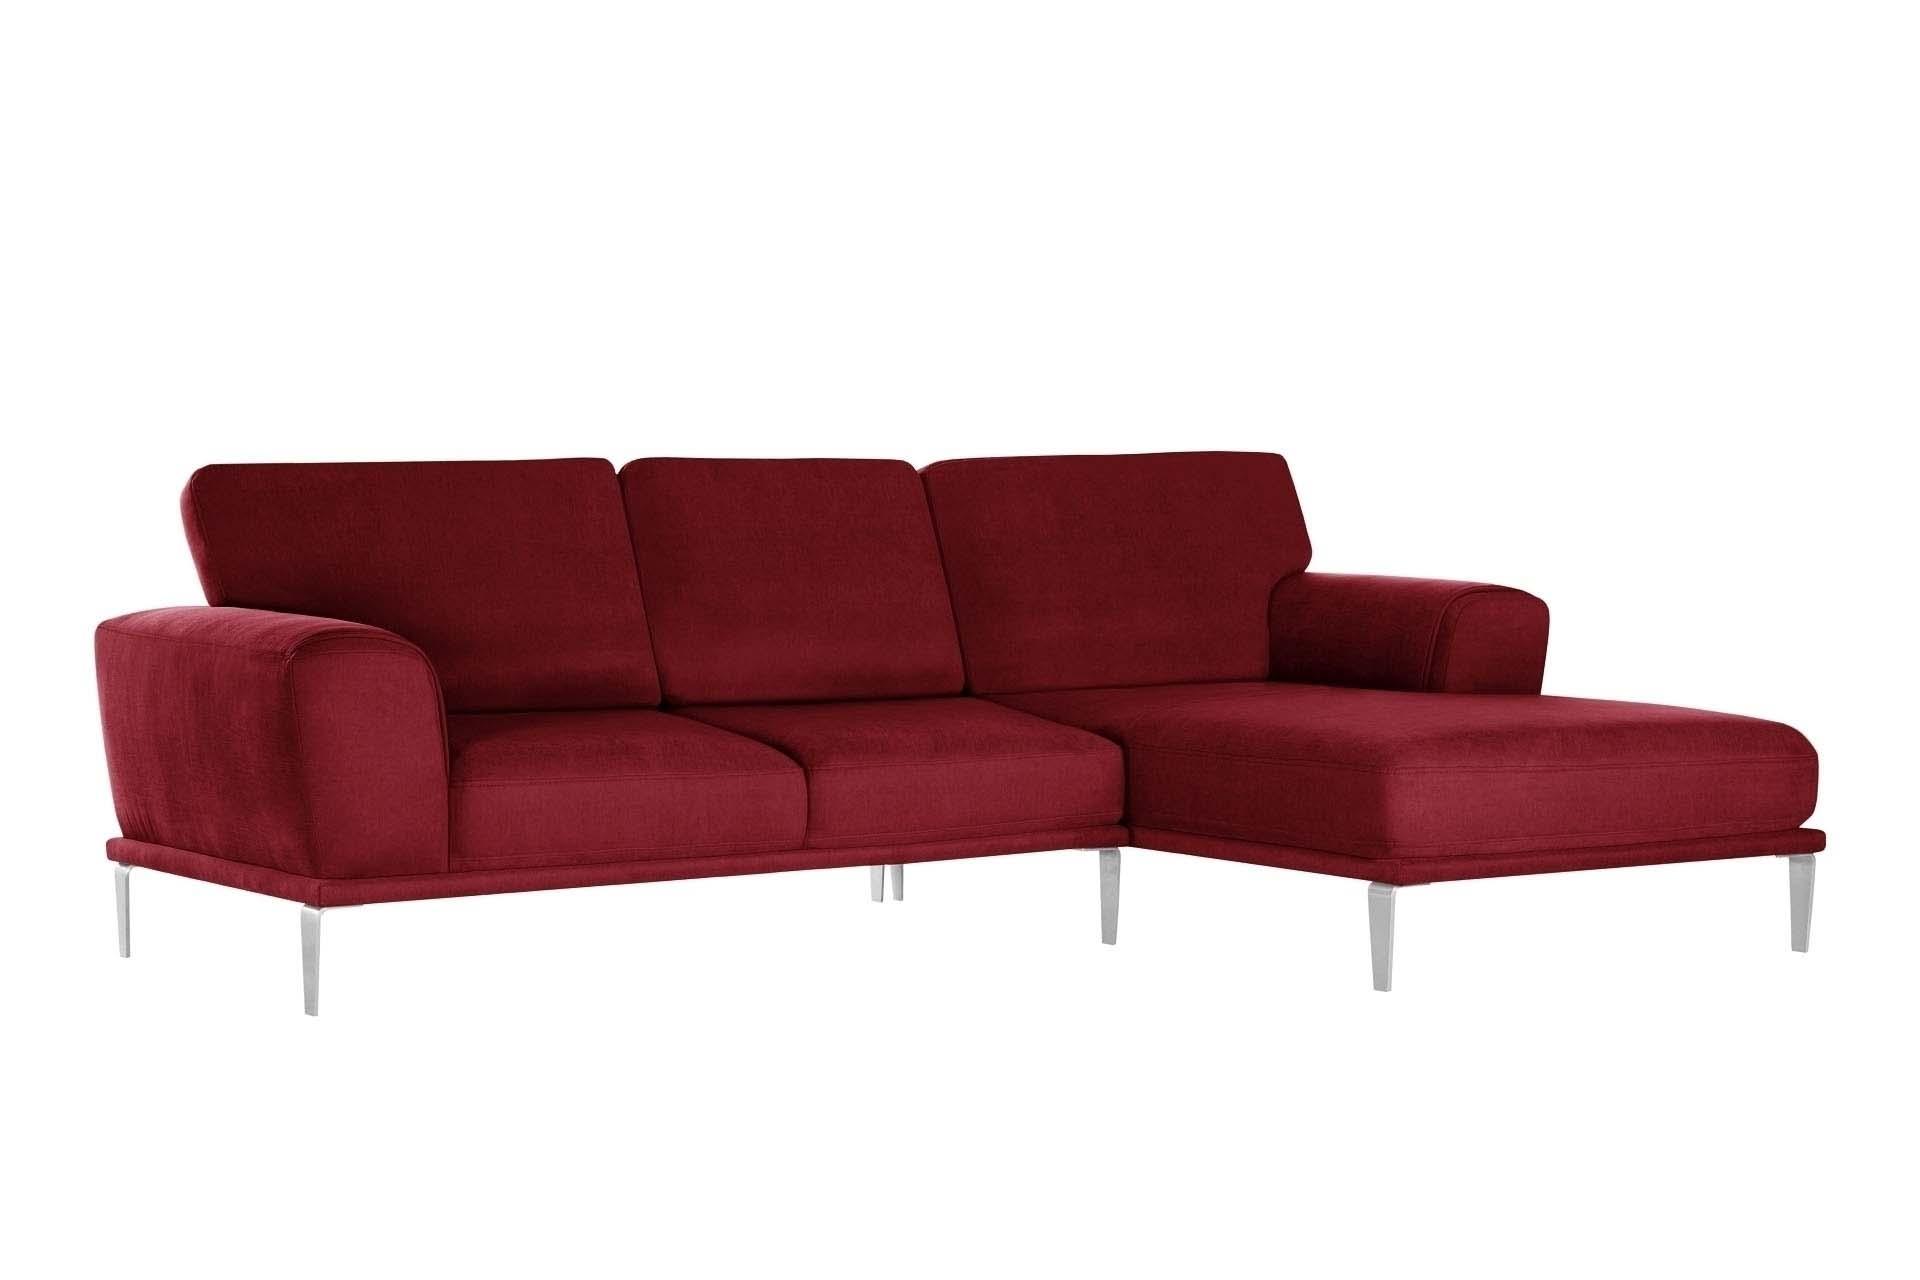 Canapé d'angle 5 places Rouge Luxe Design